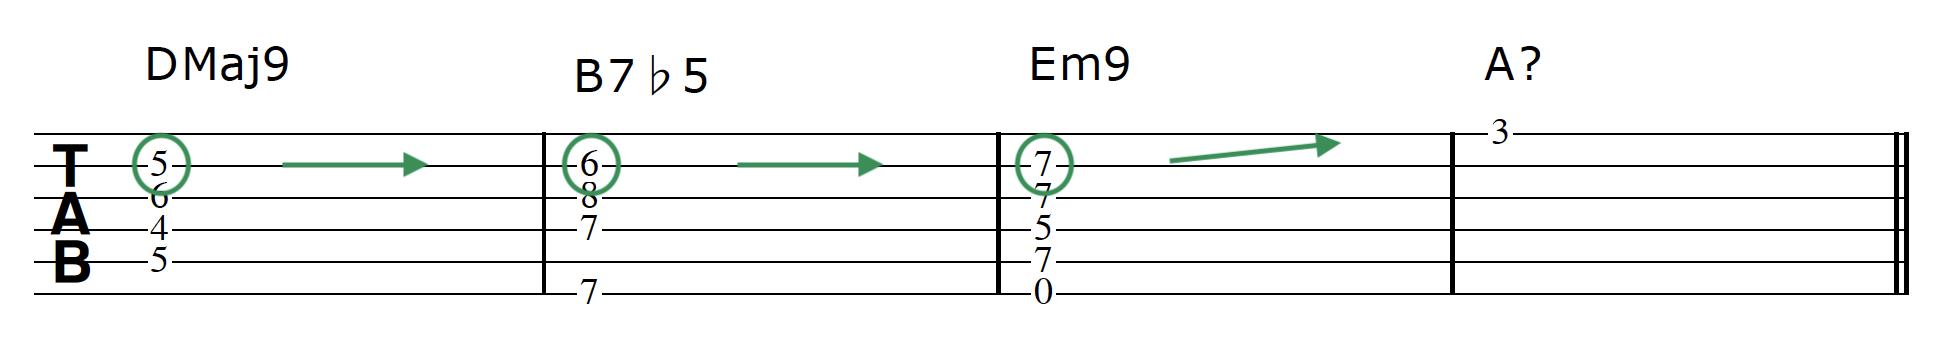 Advanced Guitar Chords Progression 1 Chord 3